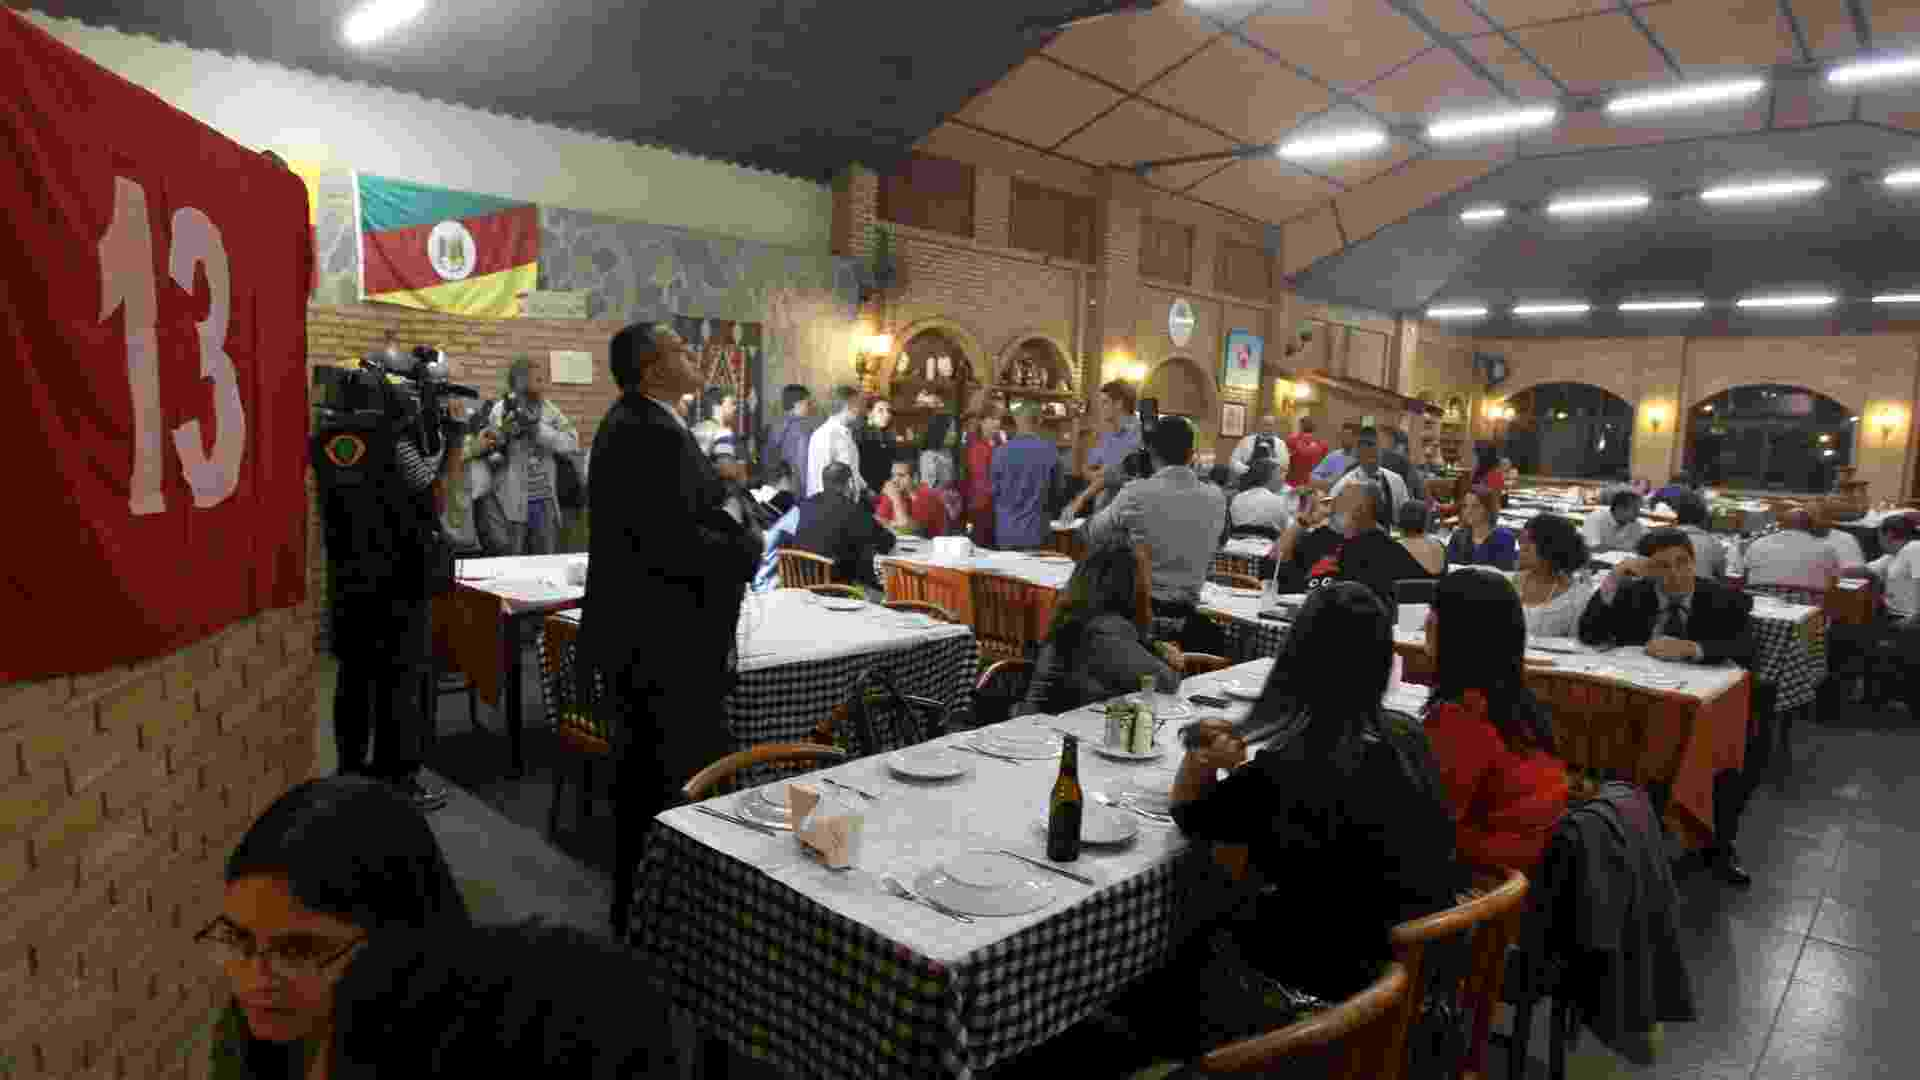 17.jan.2013 - PT realiza jantar em Brasília para pagar multas de condenados no mensalão - Roberto Jayme/UOL